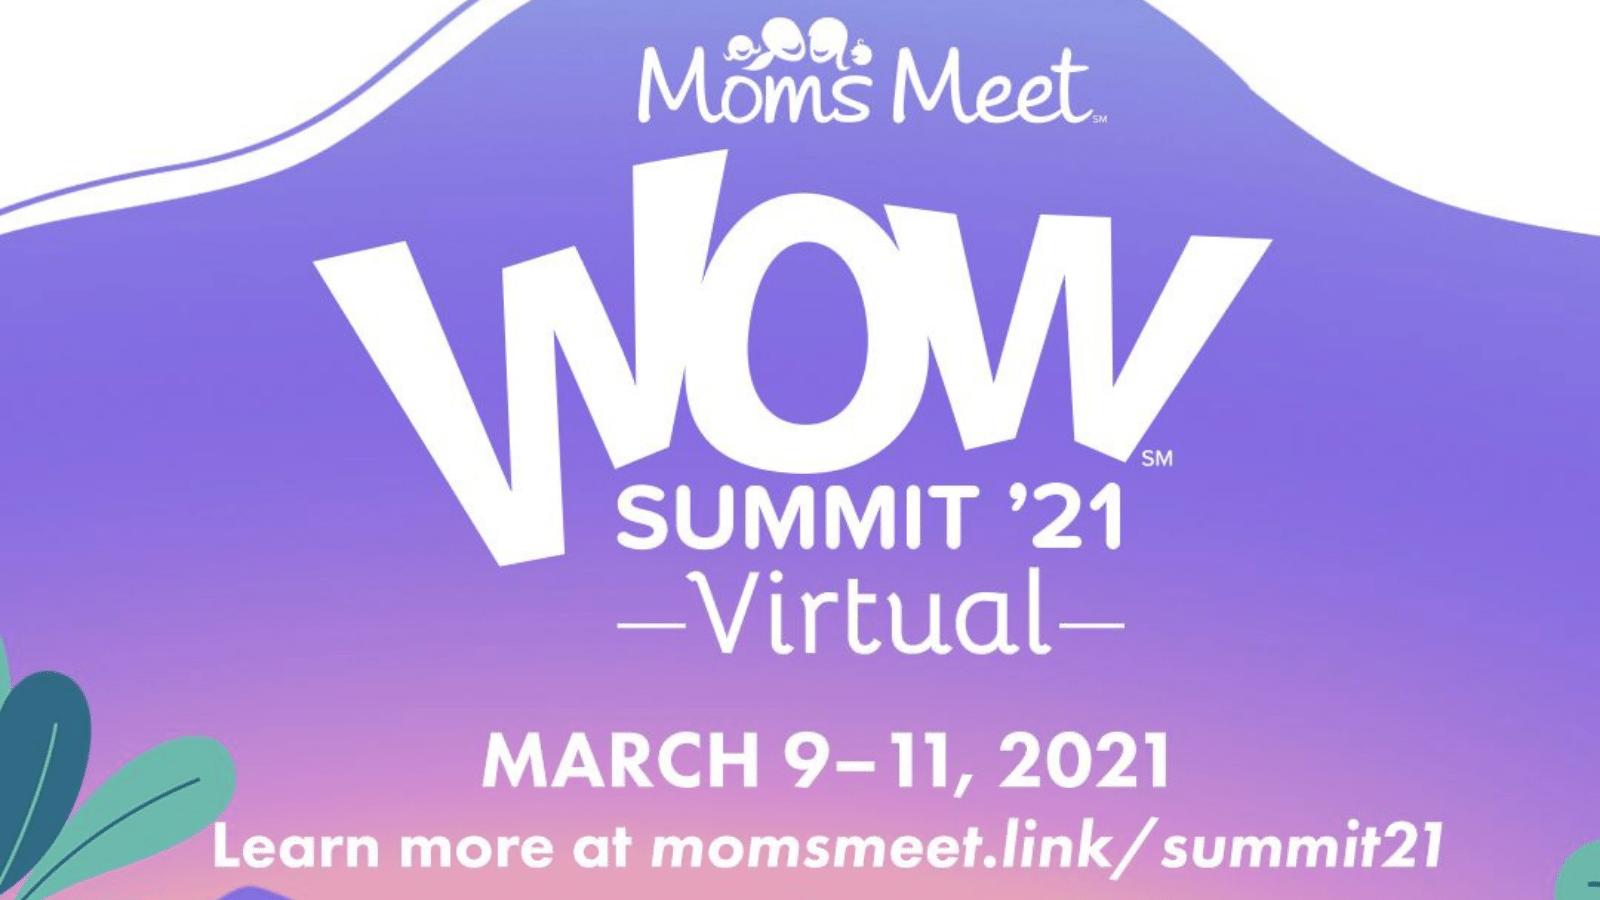 Moms Meet Virtual WOW Summit 2021